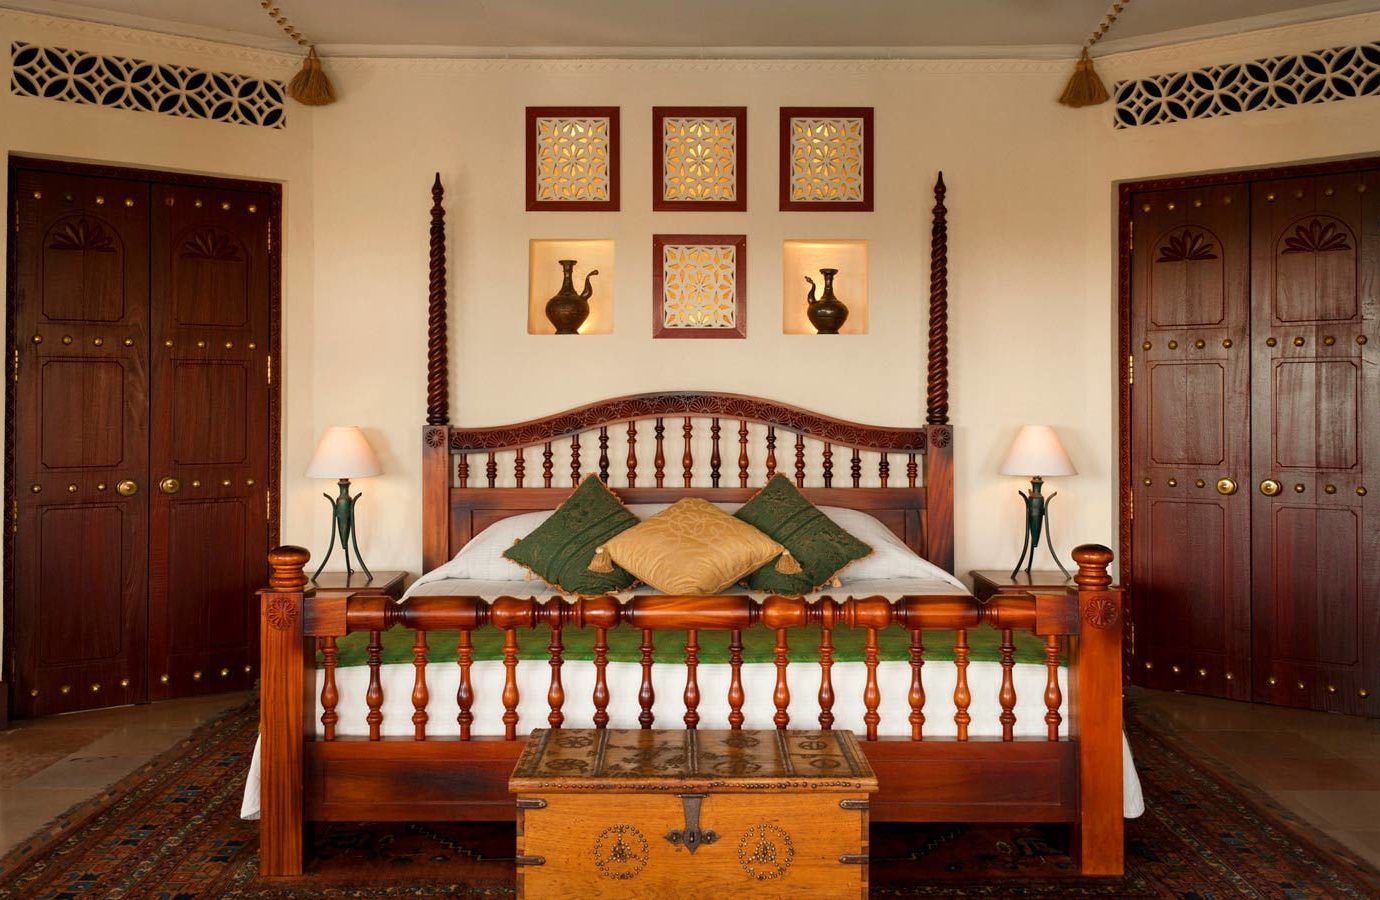 Dubai Hotels Luxury Travel Middle East furniture room bed frame interior design bed home estate Bedroom product real estate window